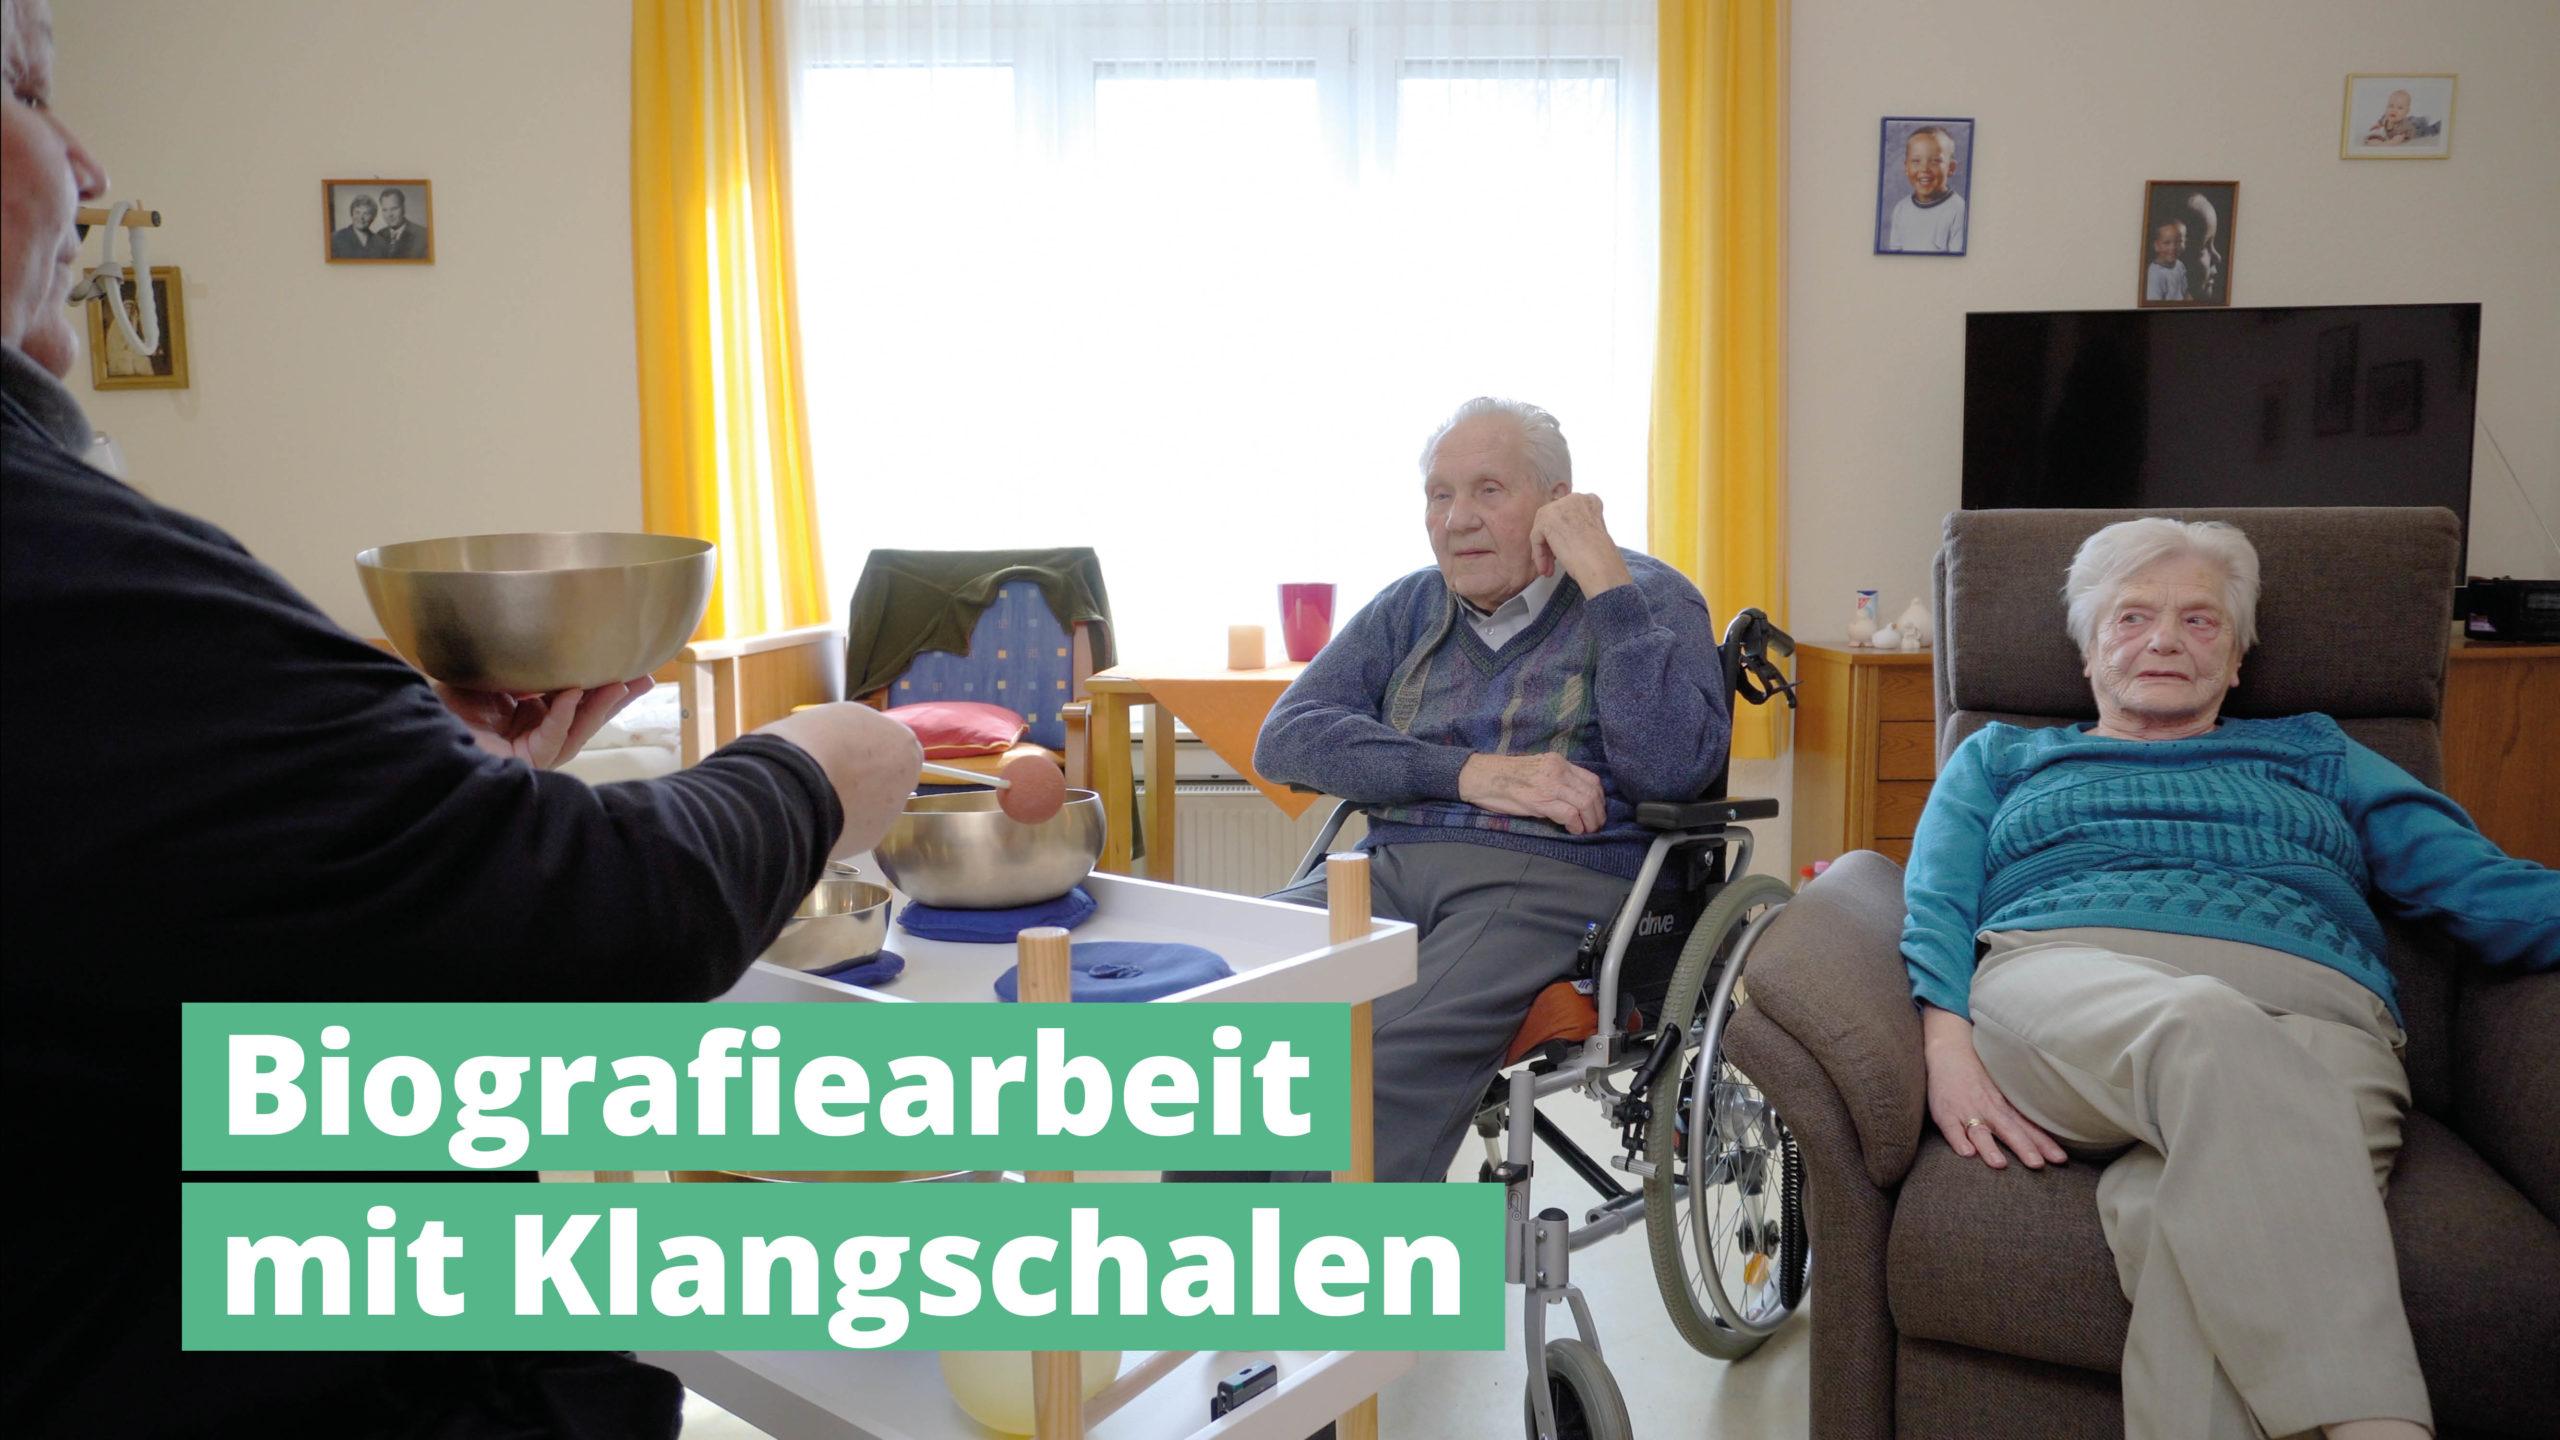 Biografiearbeit mit PeterHess Klangschalen Wir Sind Altenpflege